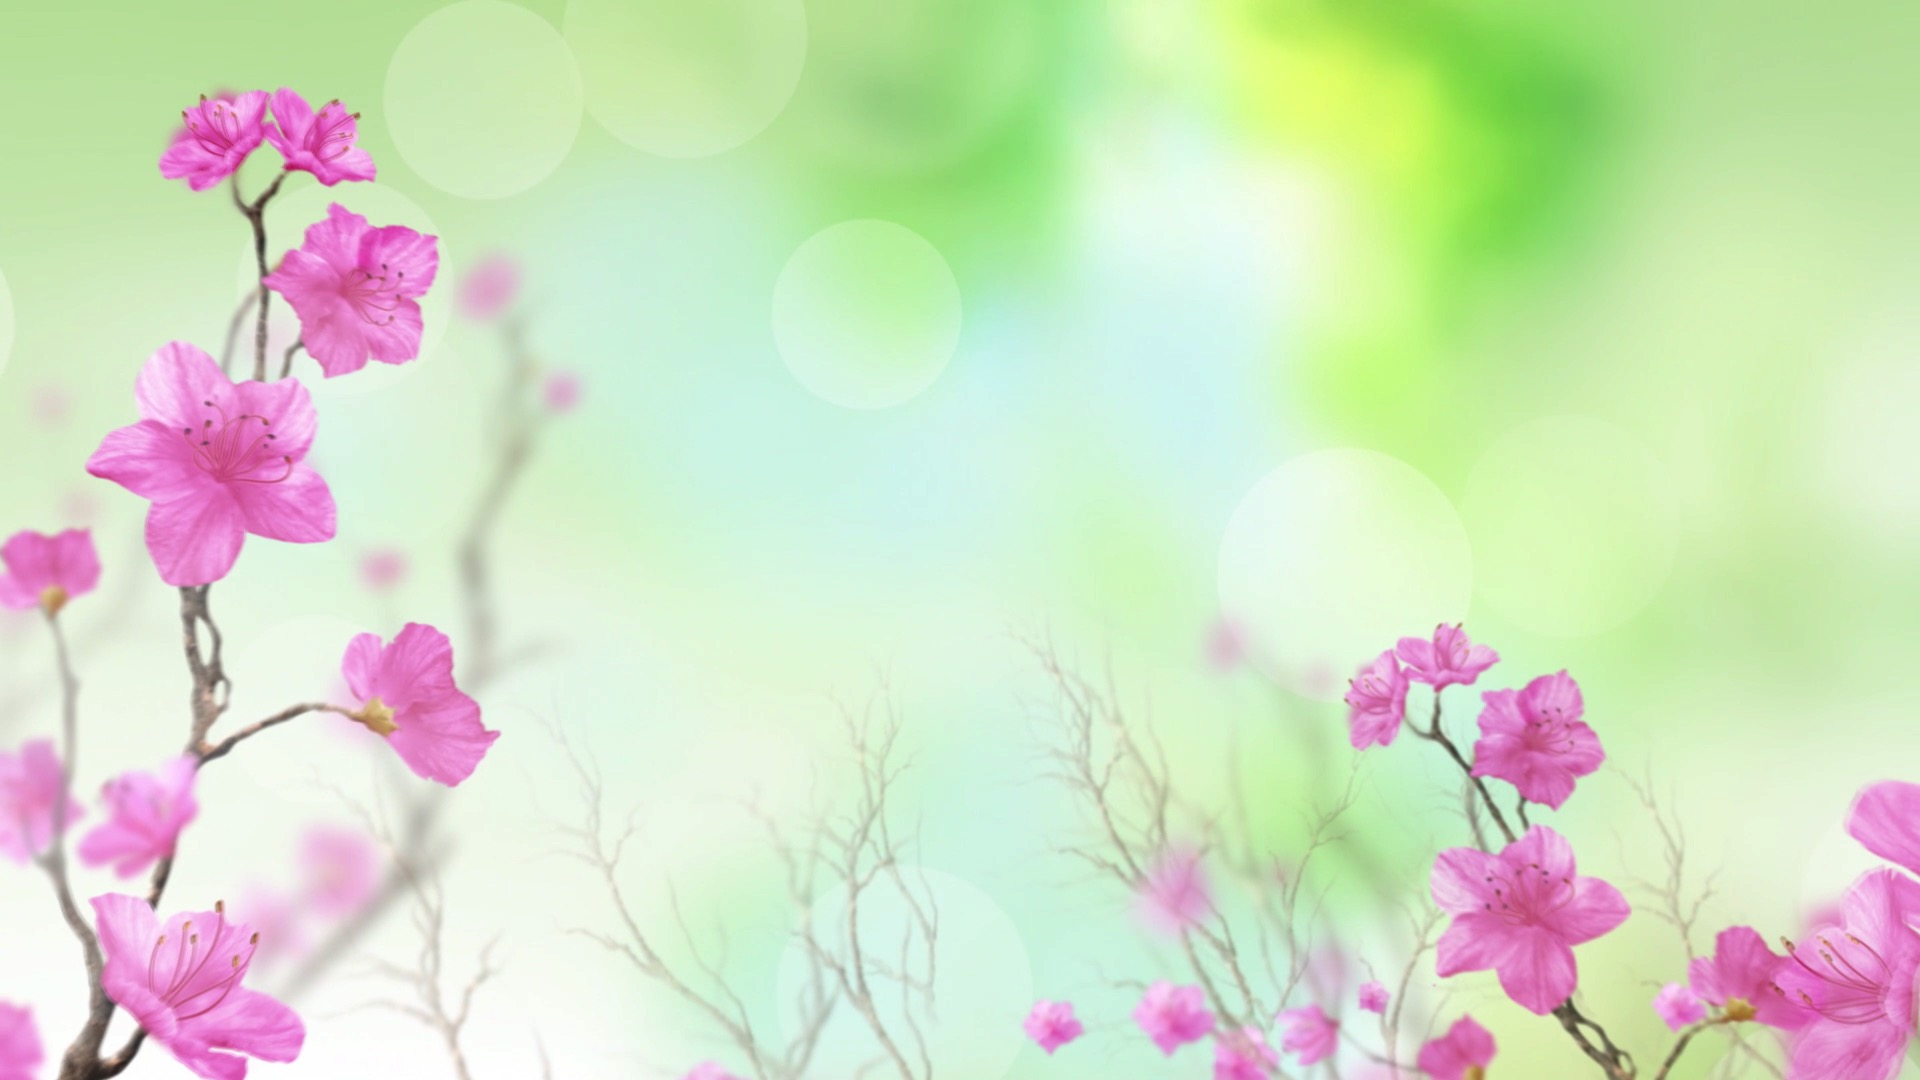 908LED大屏幕高清视频素材唯美春天花朵花卉花开舞台晚会动态背景-视频素材-sucai.tv